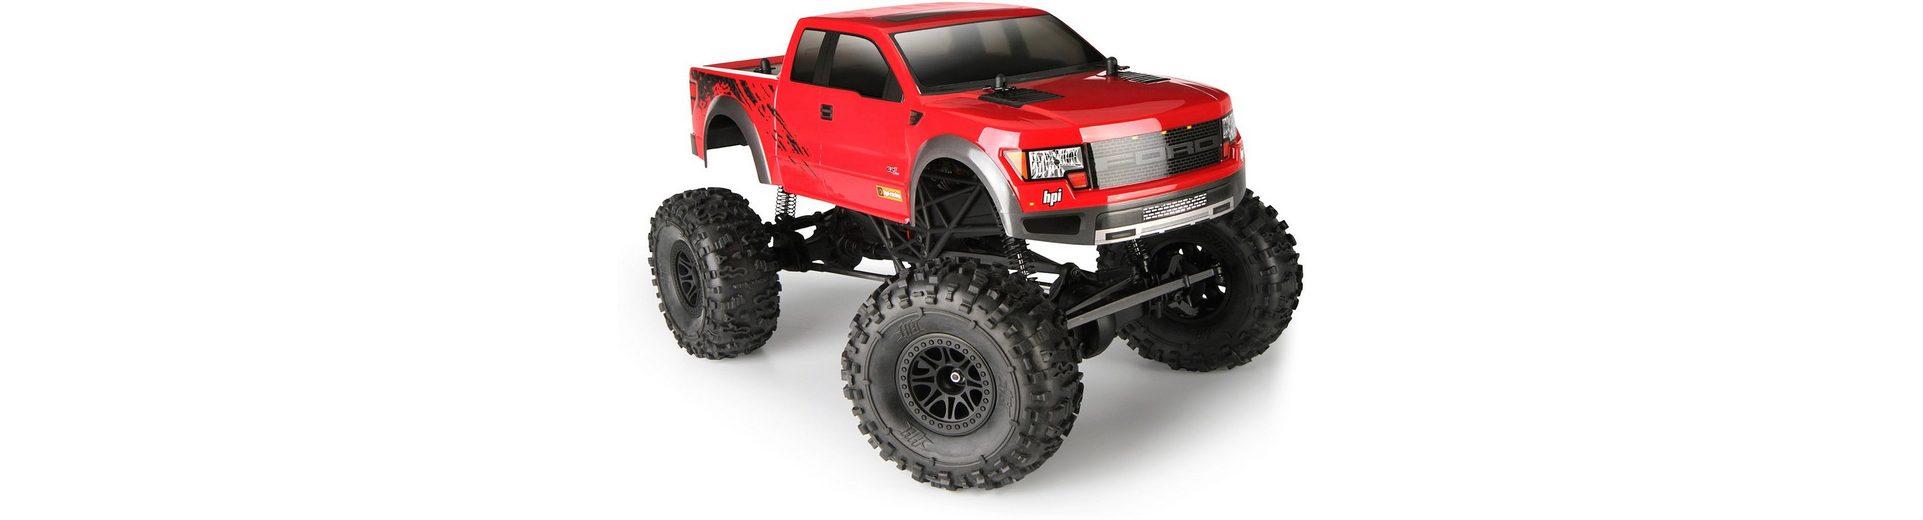 HPI Racing RC Komplettset, »Crawler King, Ford Raptor 1:10 2,4 GHz«